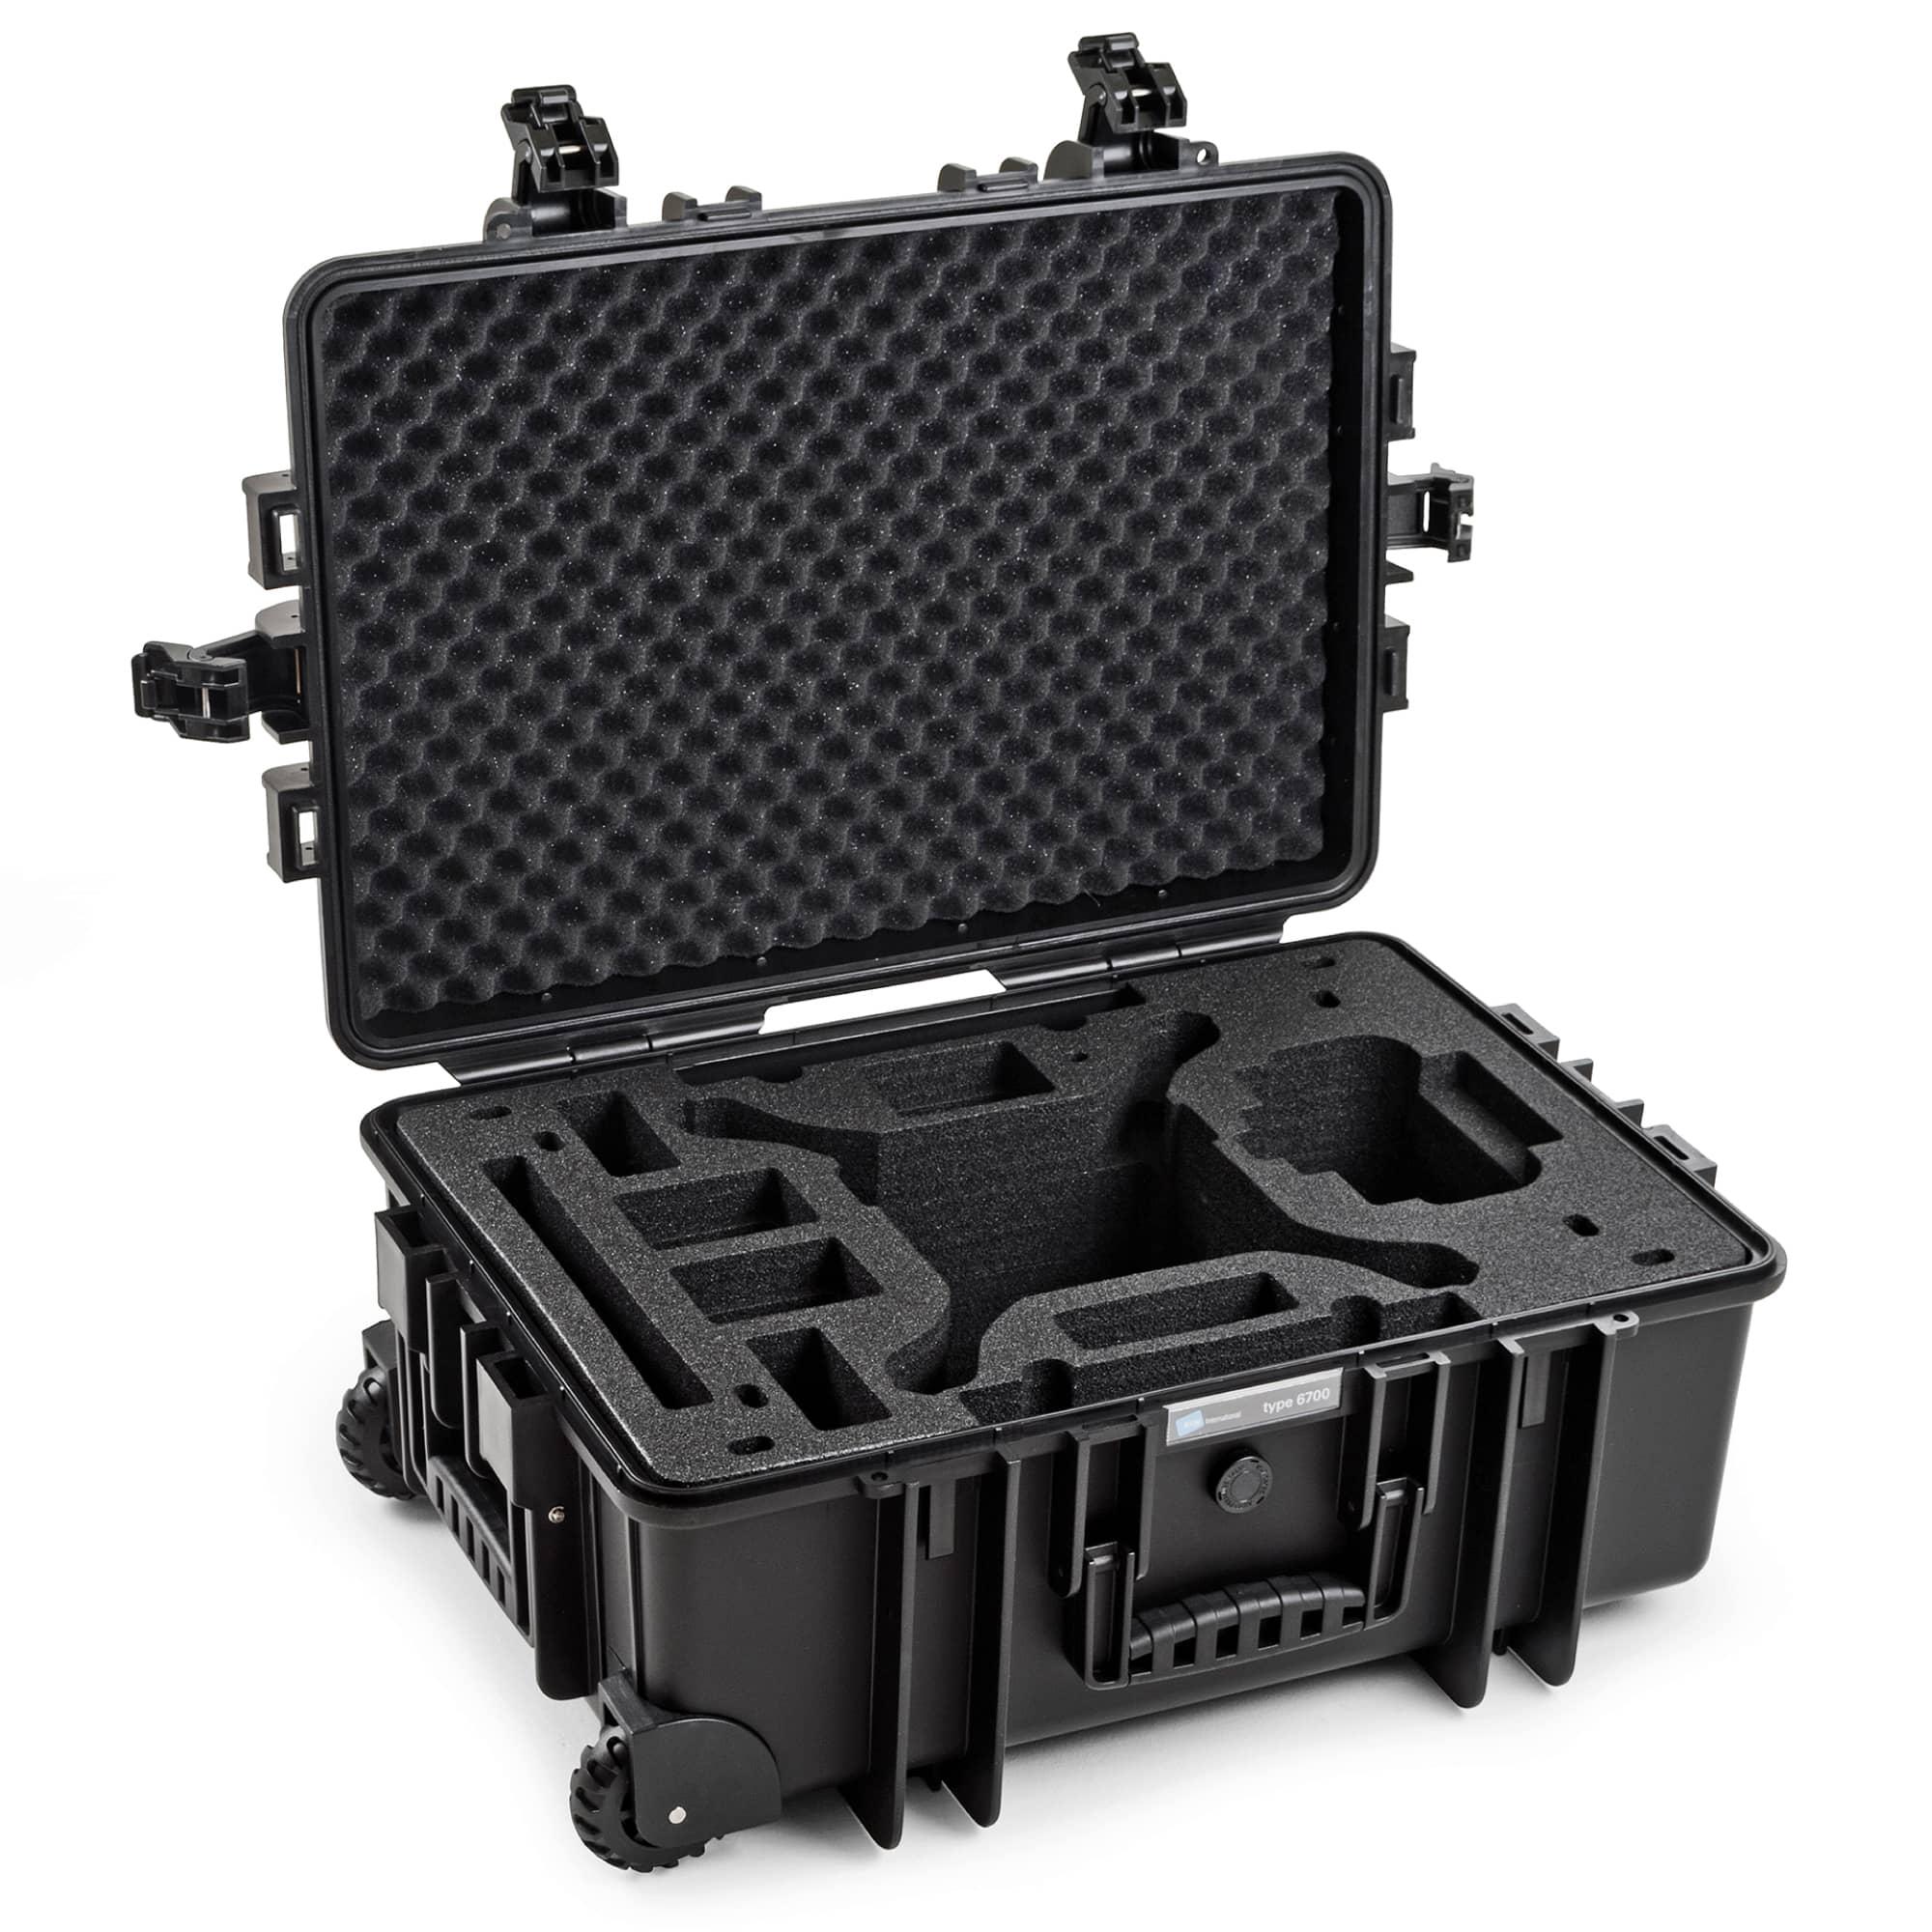 DJI Phantom  4 / 4 Pro / 4 Pro Plus / 4 advanced / 4 Obsidian | B&W Outdoor Case Typ 6700